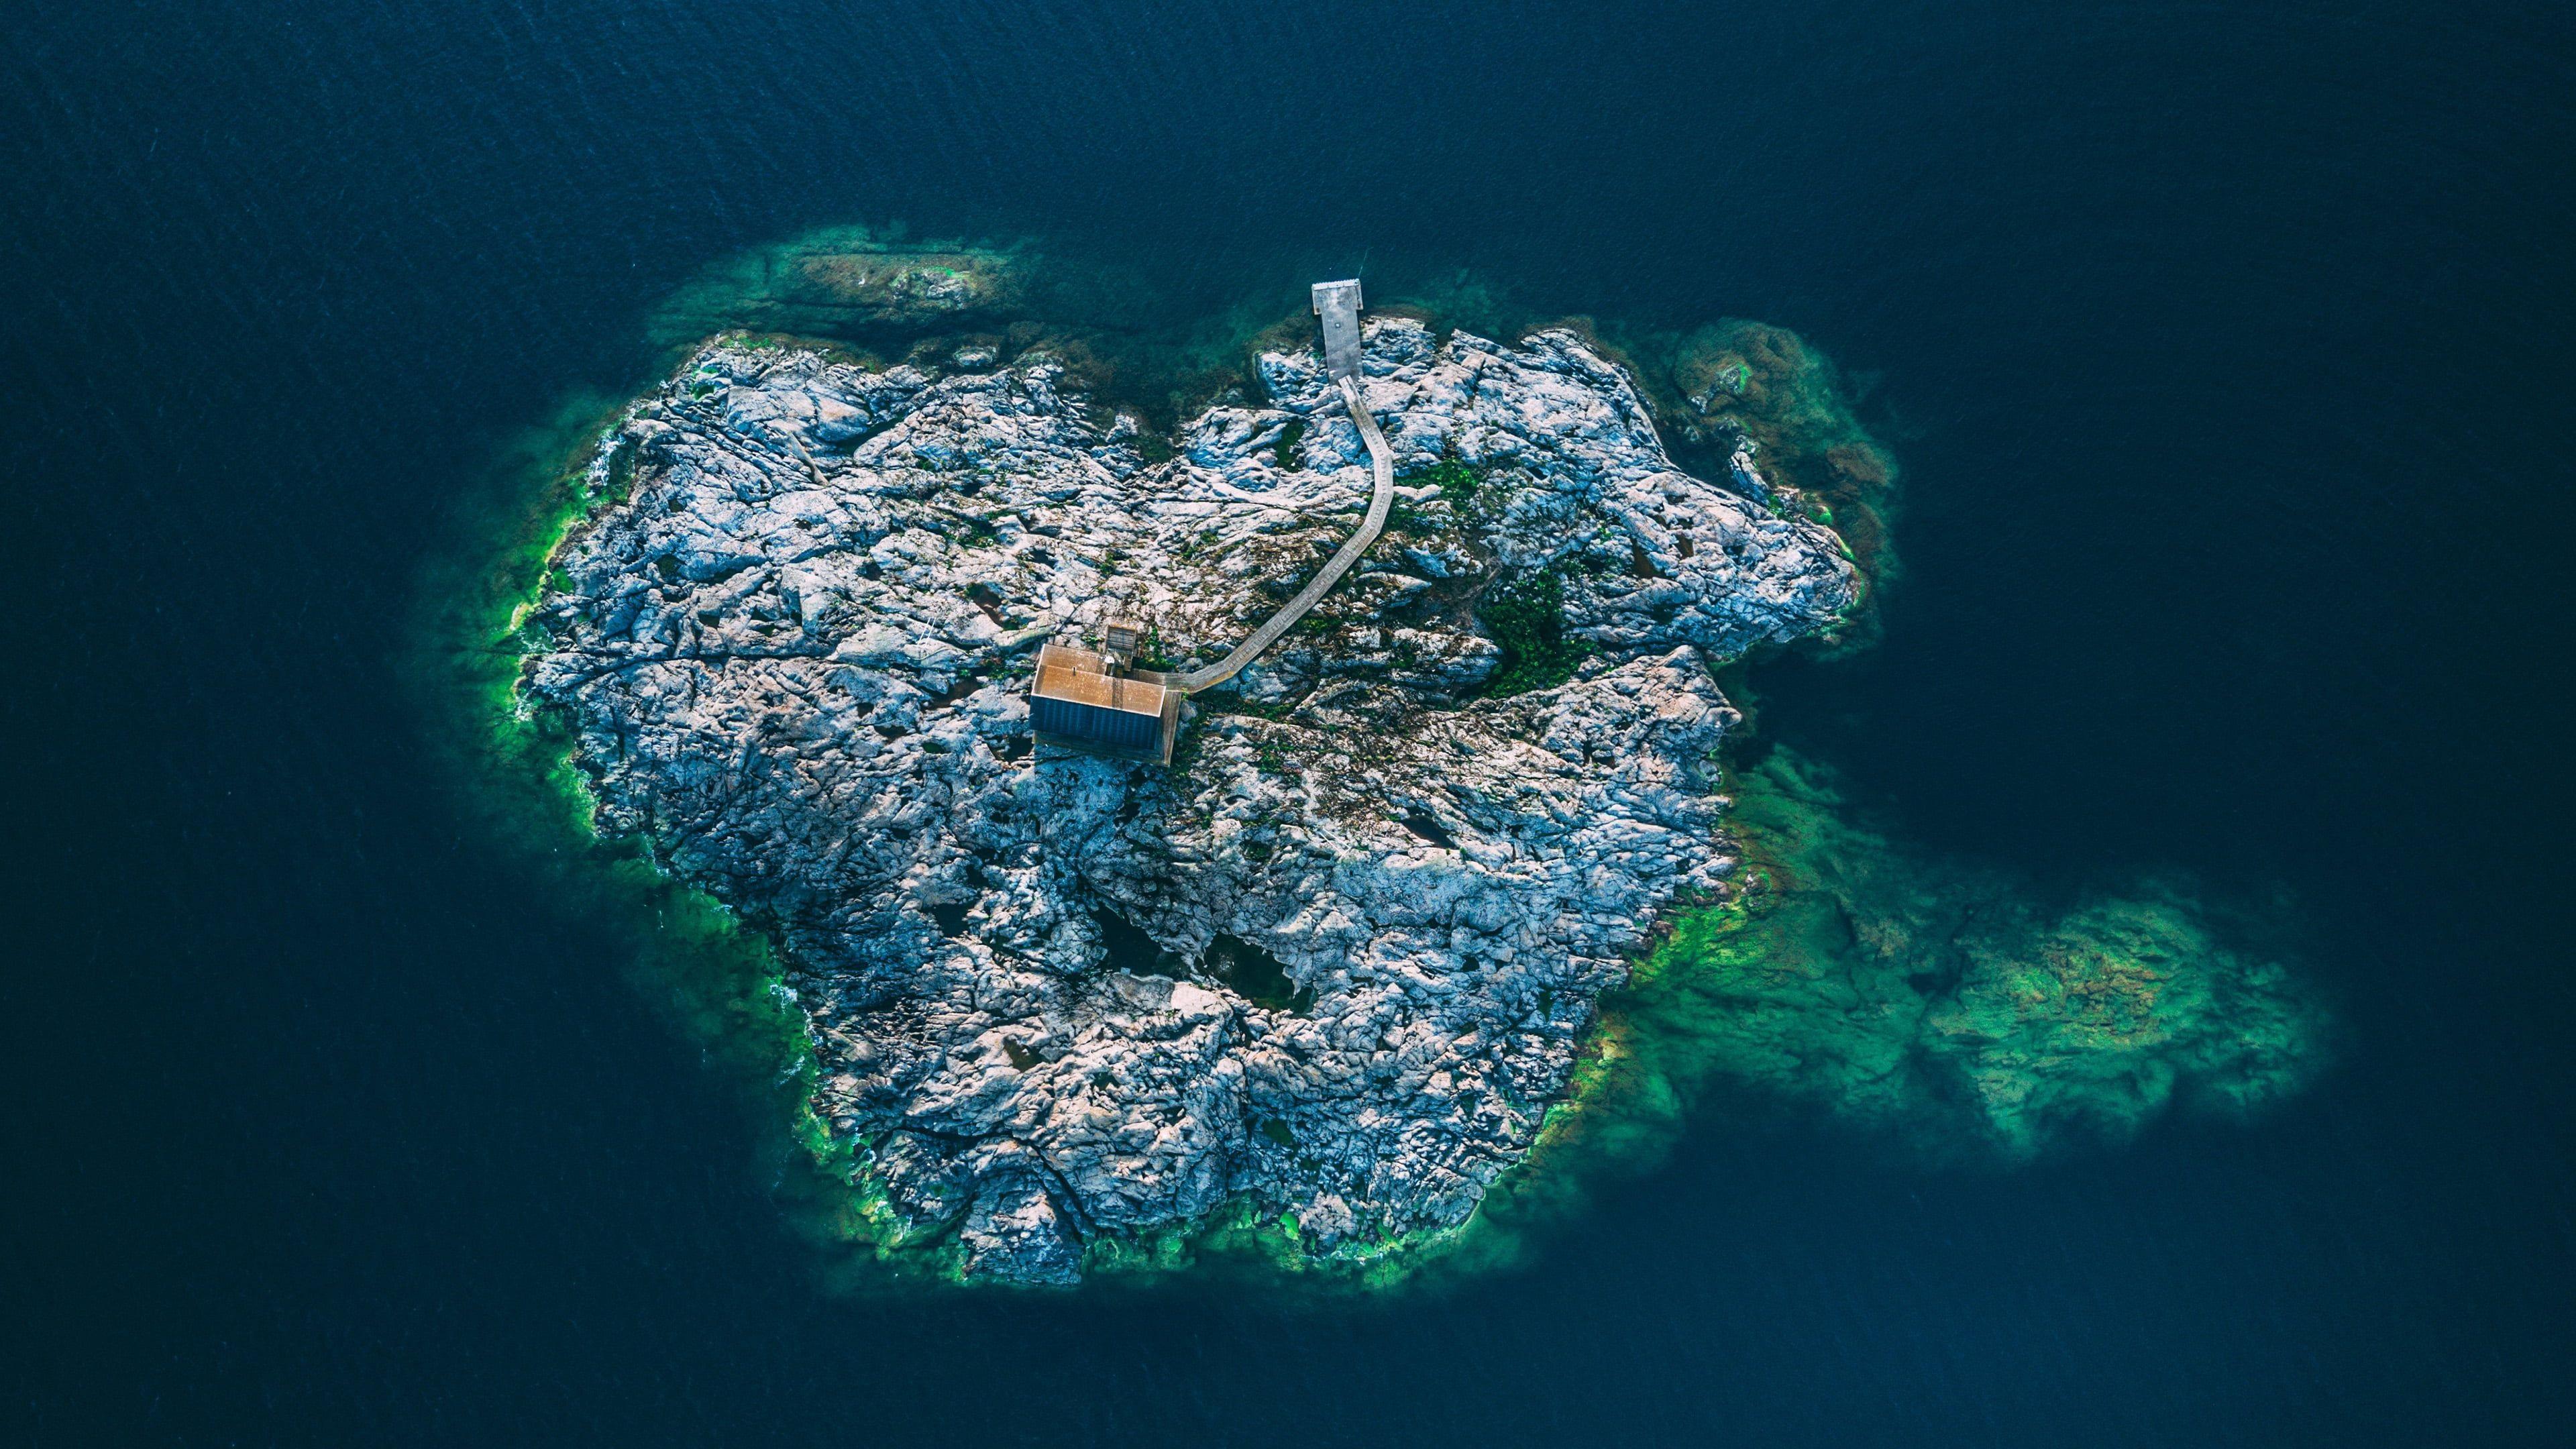 Pin By Miguel Hidalgo On Dragon Sea And Ocean Remote Island Drone Photography